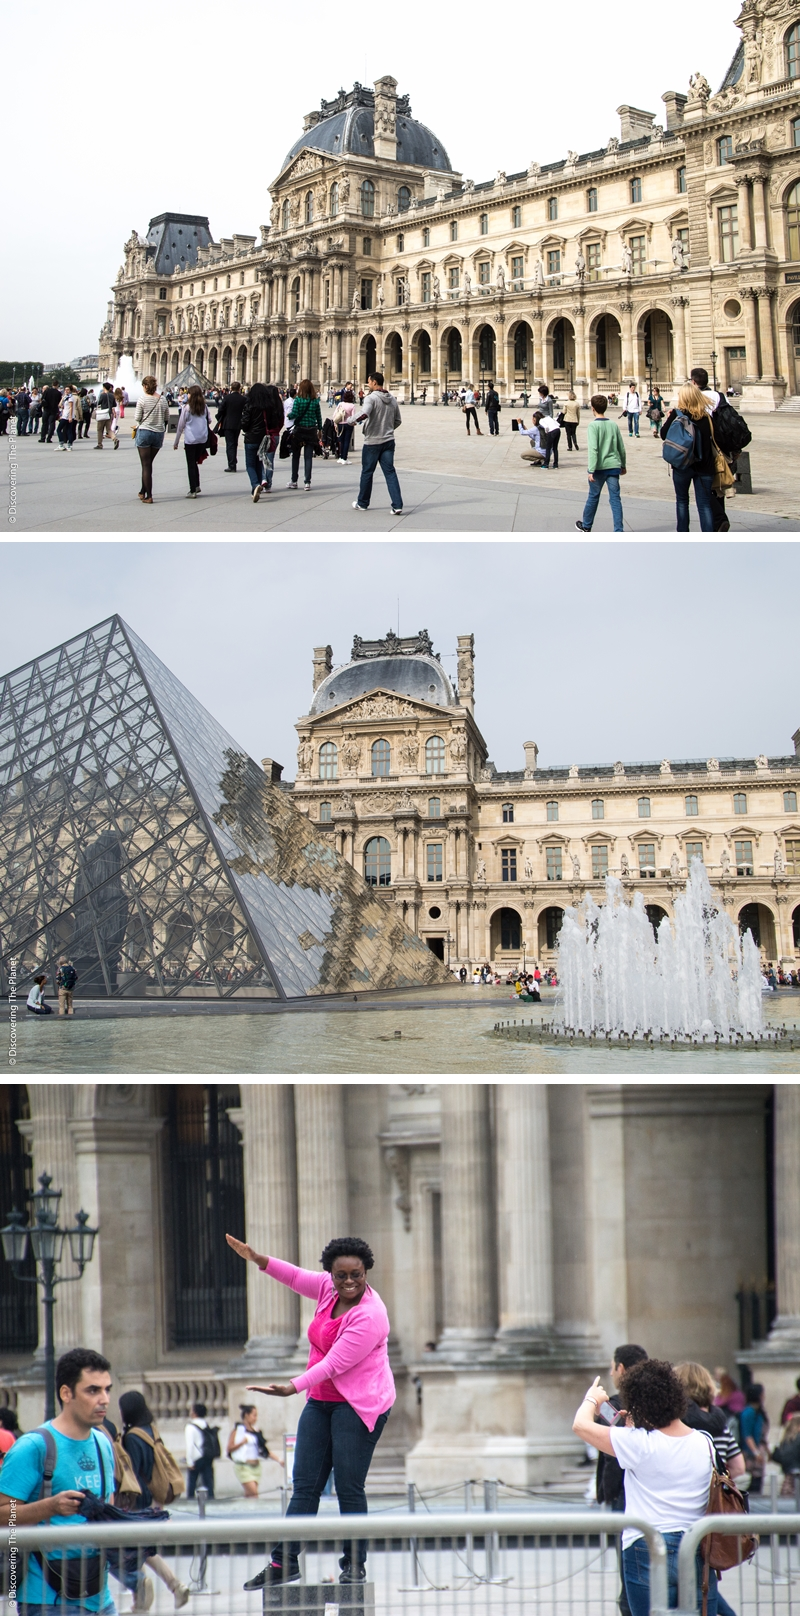 Frankrike, Paris, Louvren